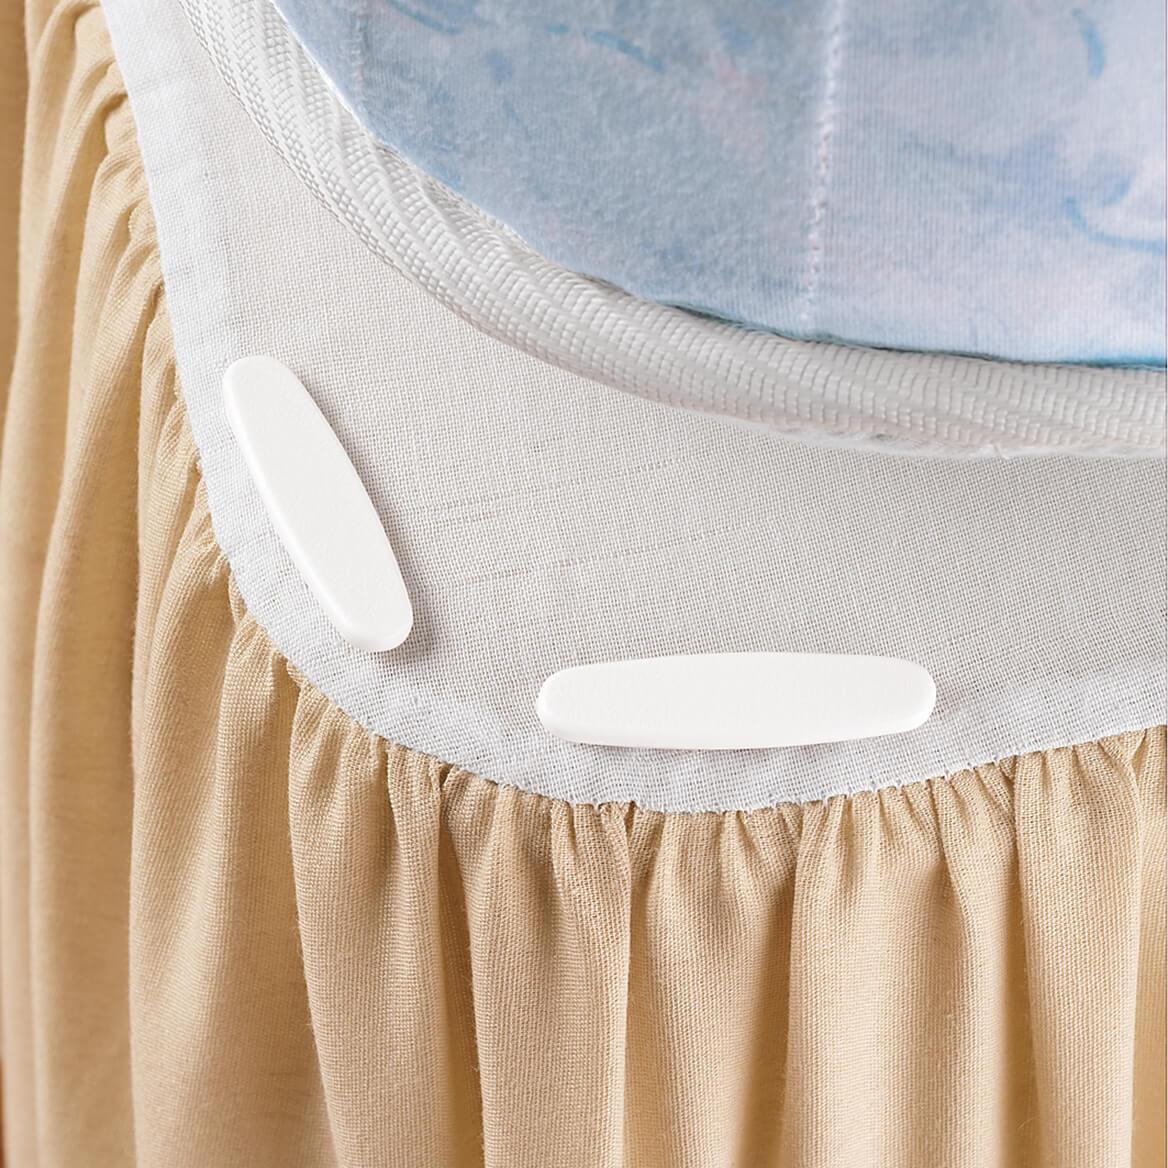 Long Bed Skirt Pin Set Pack Of 8 Pins